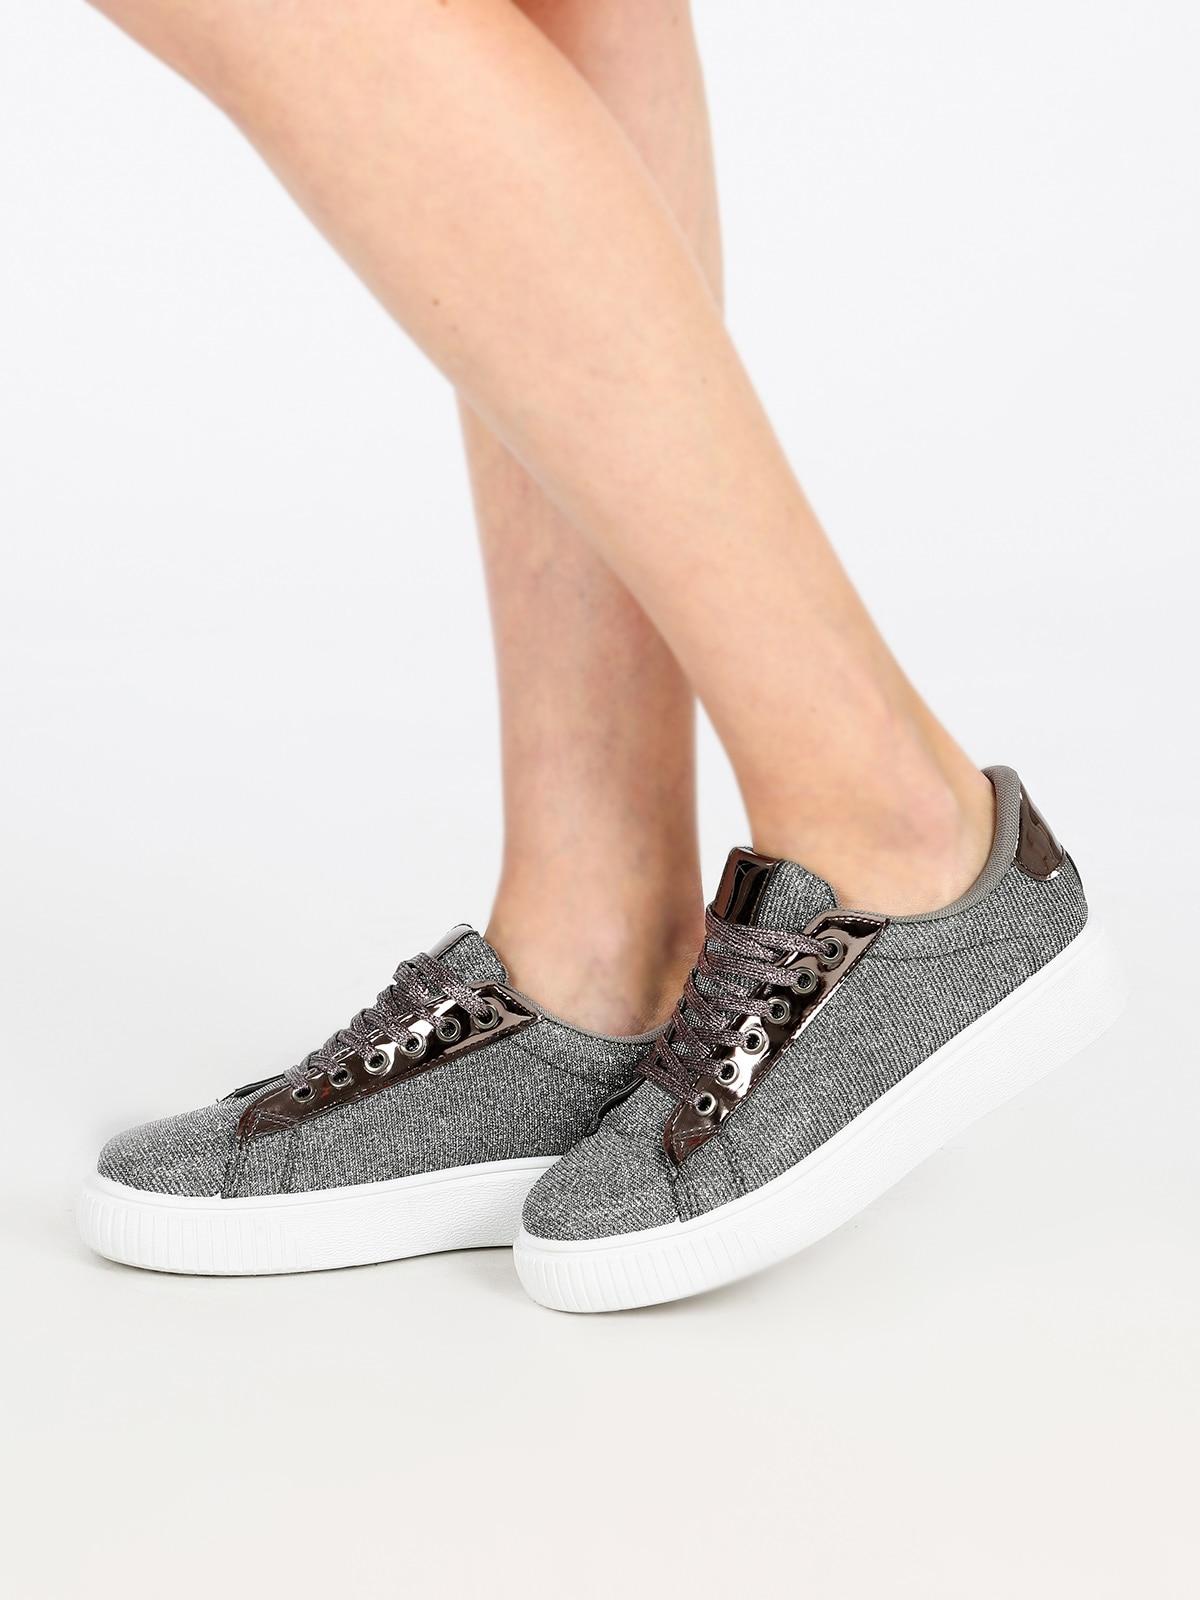 Low Sneakers Lurex